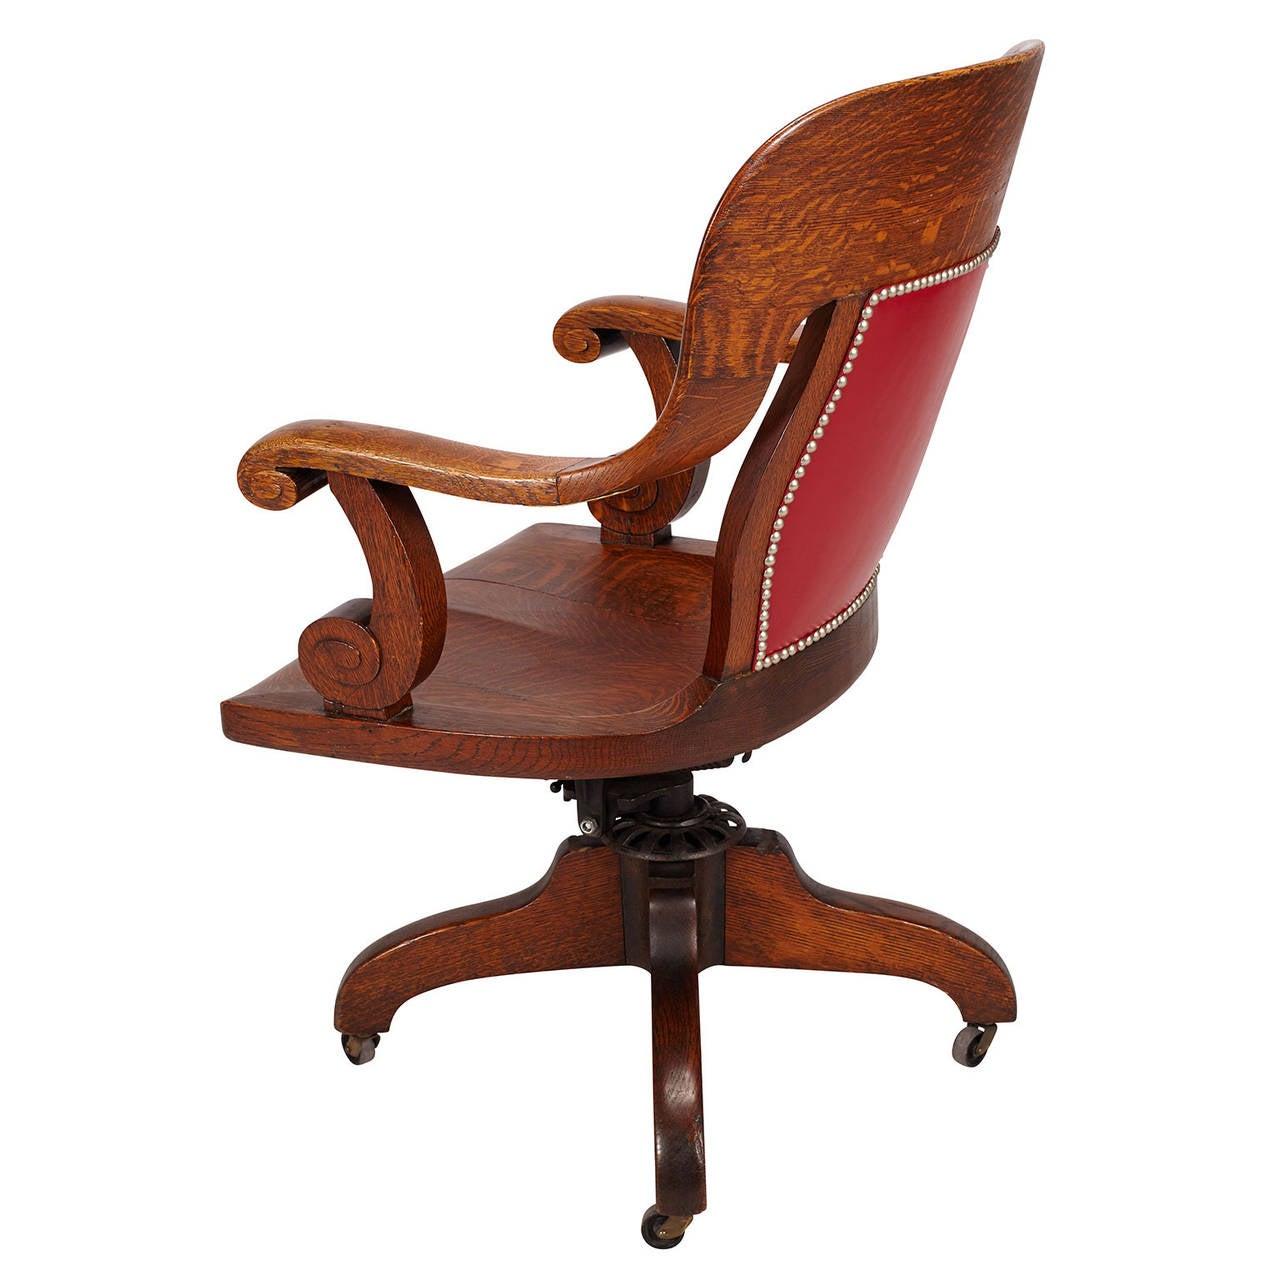 Oak Swivel Bankers Chair at 1stdibs : 15030512190135l from 1stdibs.com size 1280 x 1280 jpeg 105kB